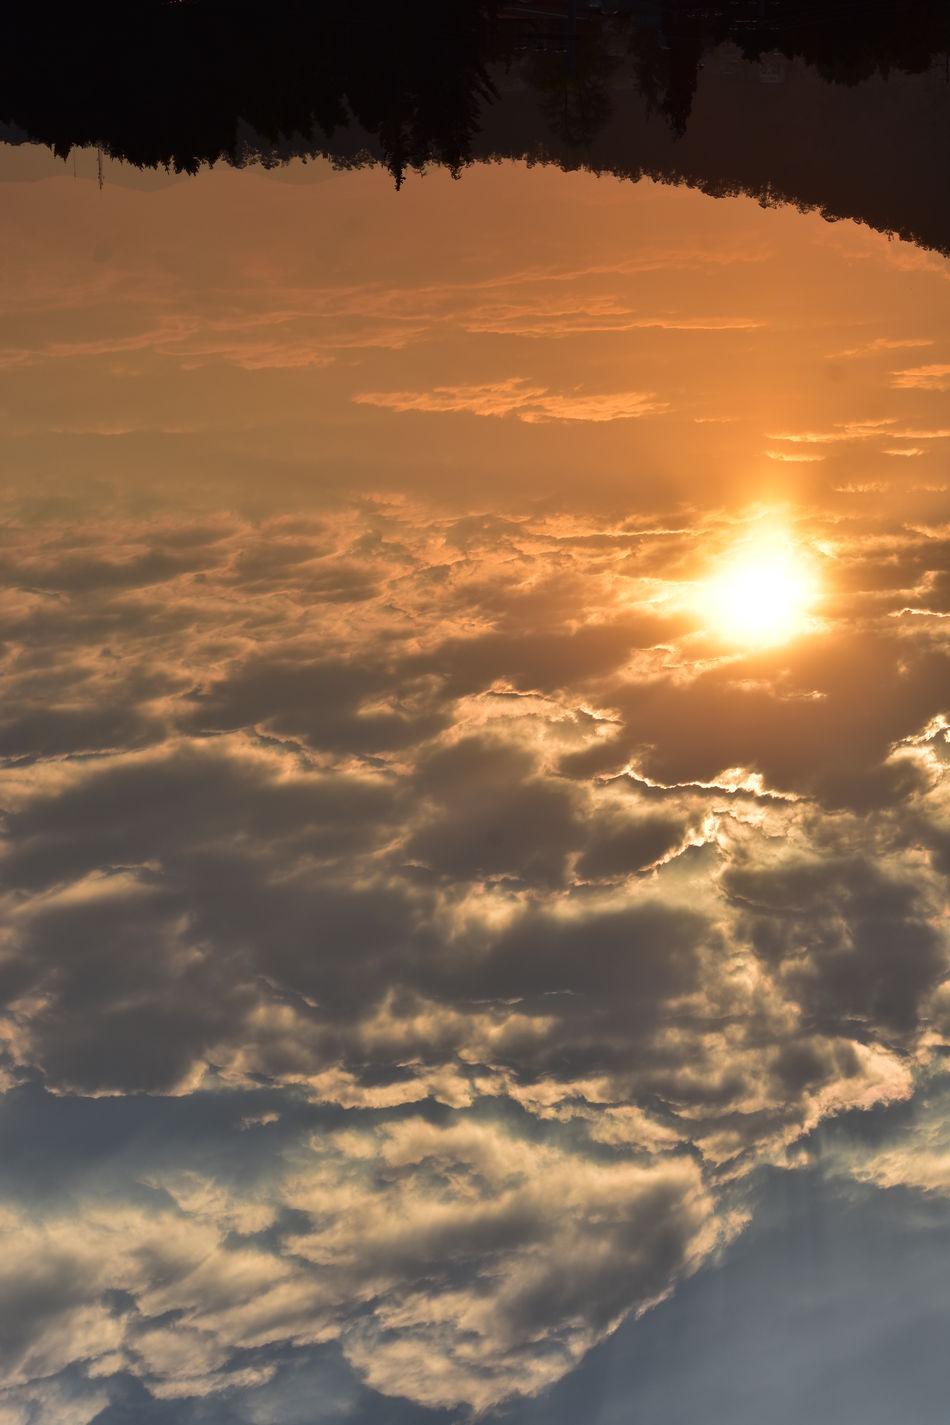 Let your imagination fly awar Lifeofpi SwordArtOnline Sunset Different Perspective Sunlight Faraway Cloud - Sky